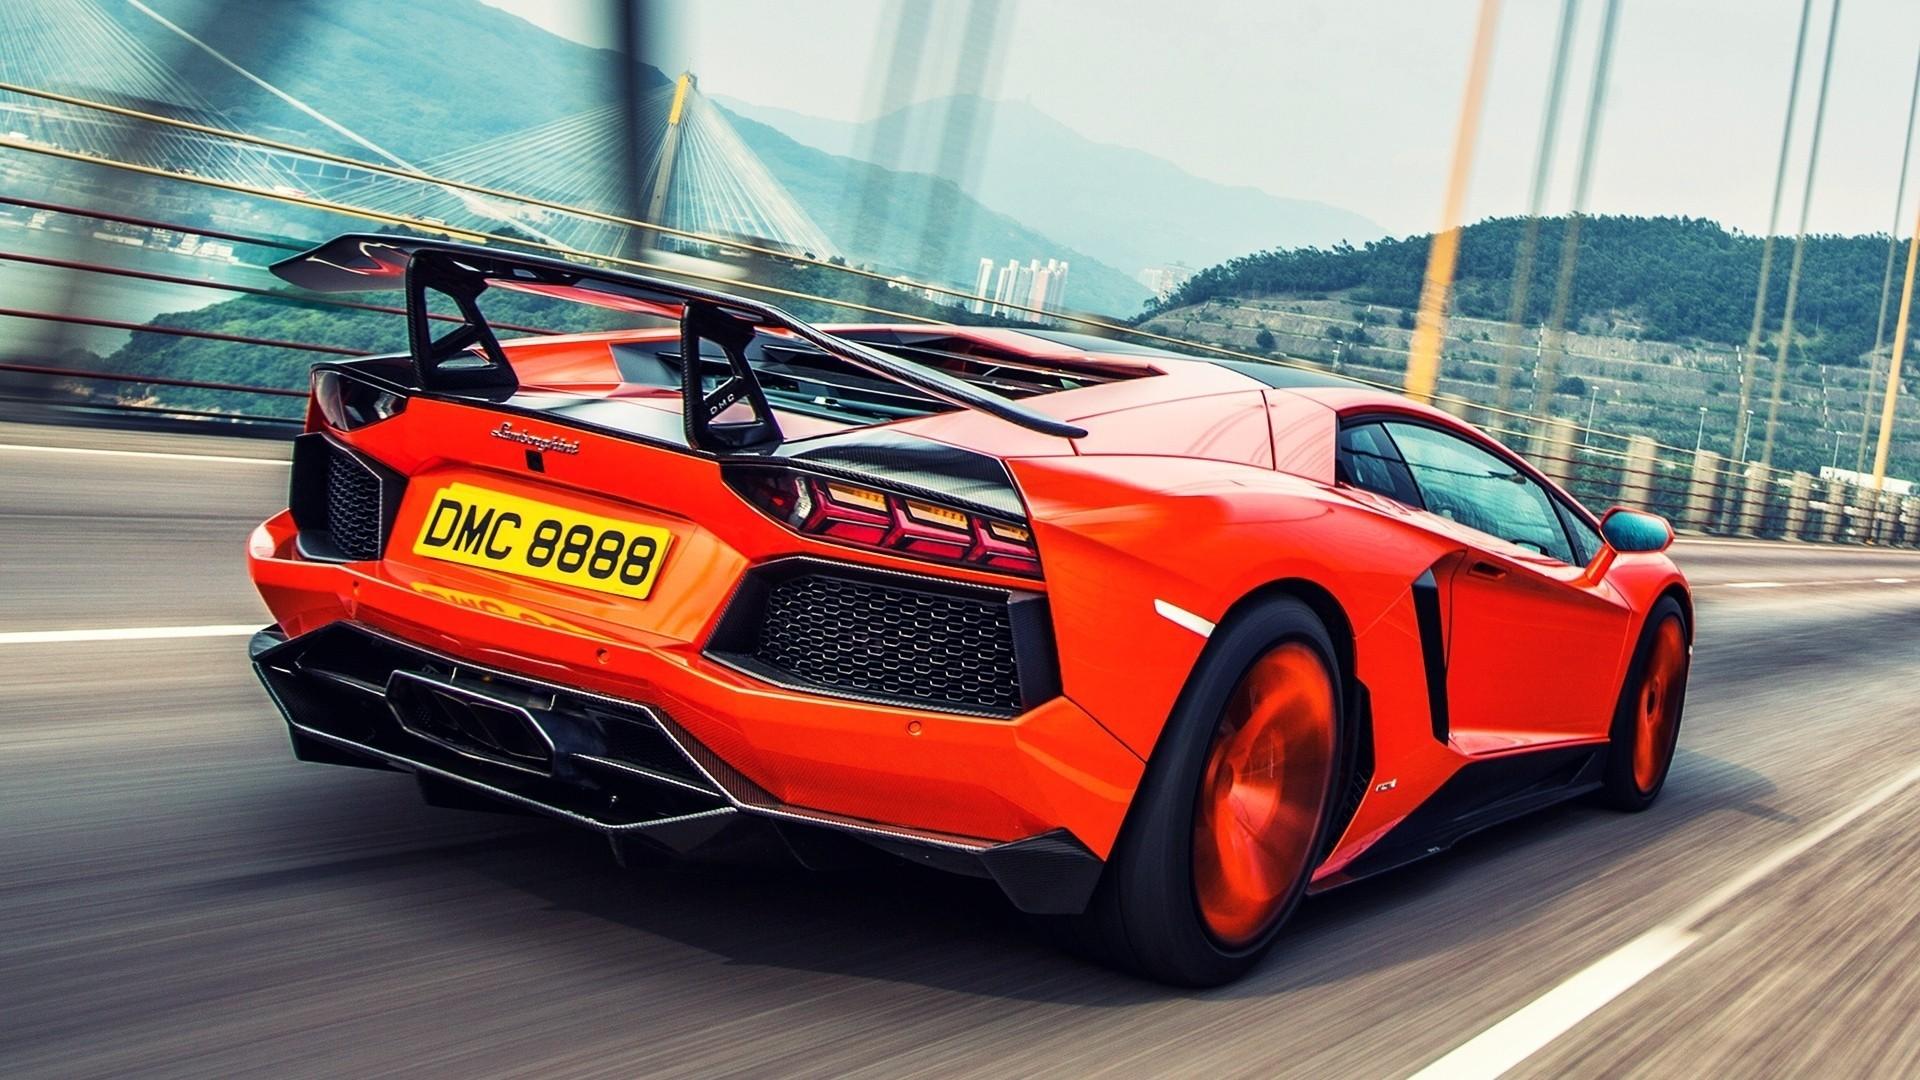 820 Gambar Mobil Sport Blur HD Terbaru